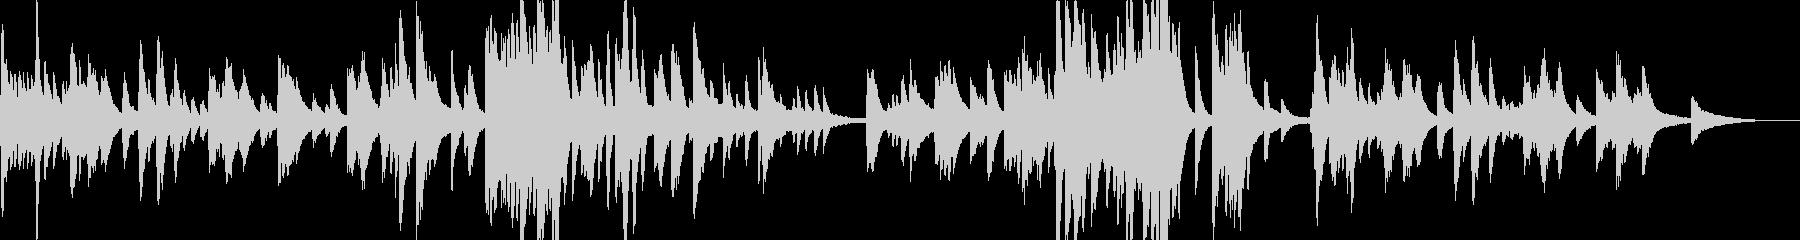 KANT寂しげな夏のバラード612の未再生の波形